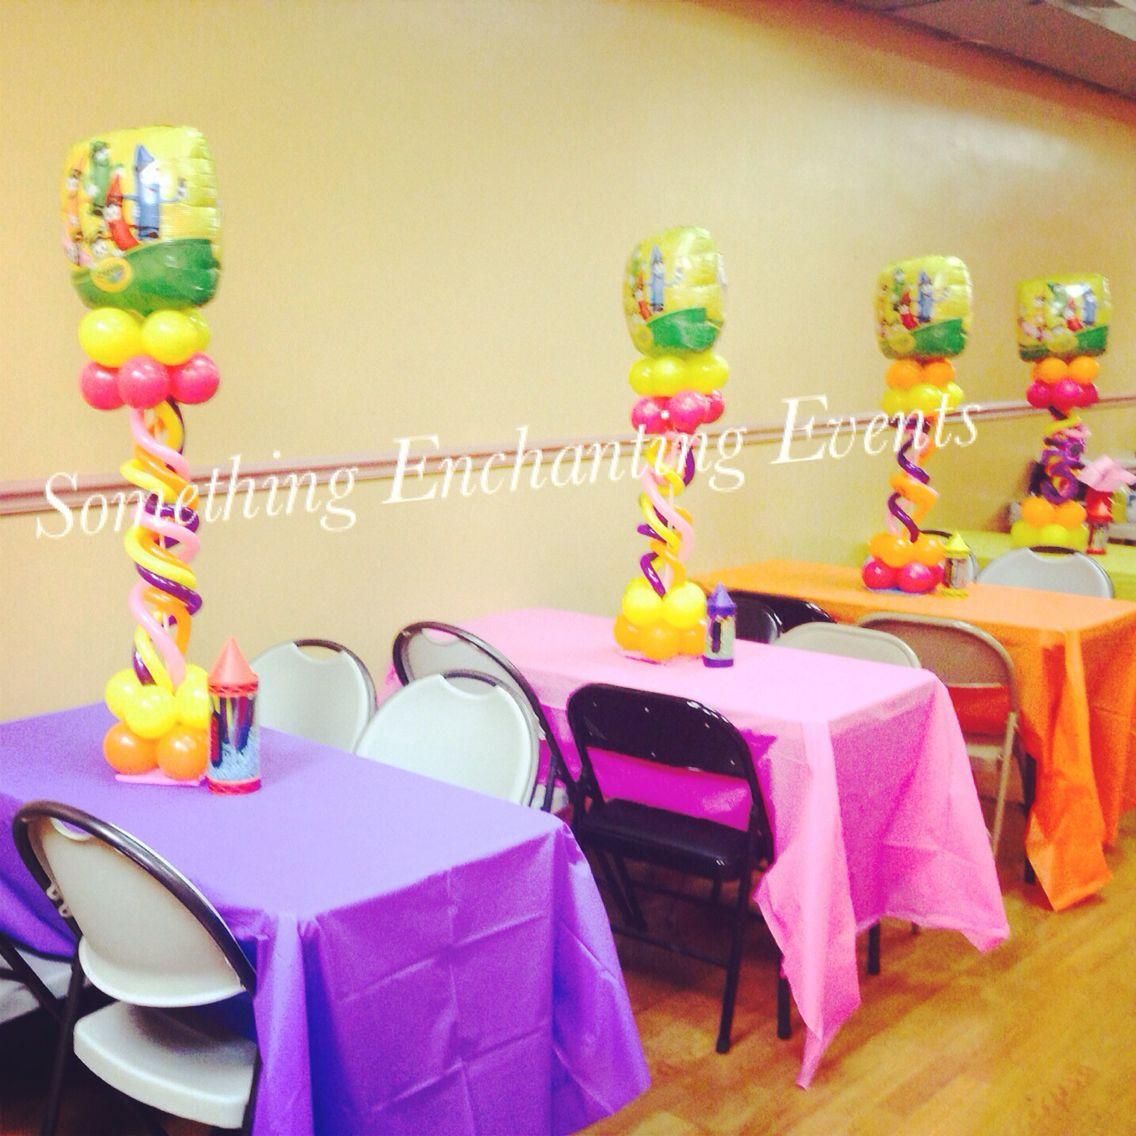 Crayon balloon theme centerpieces | Kids birthday | Pinterest ...